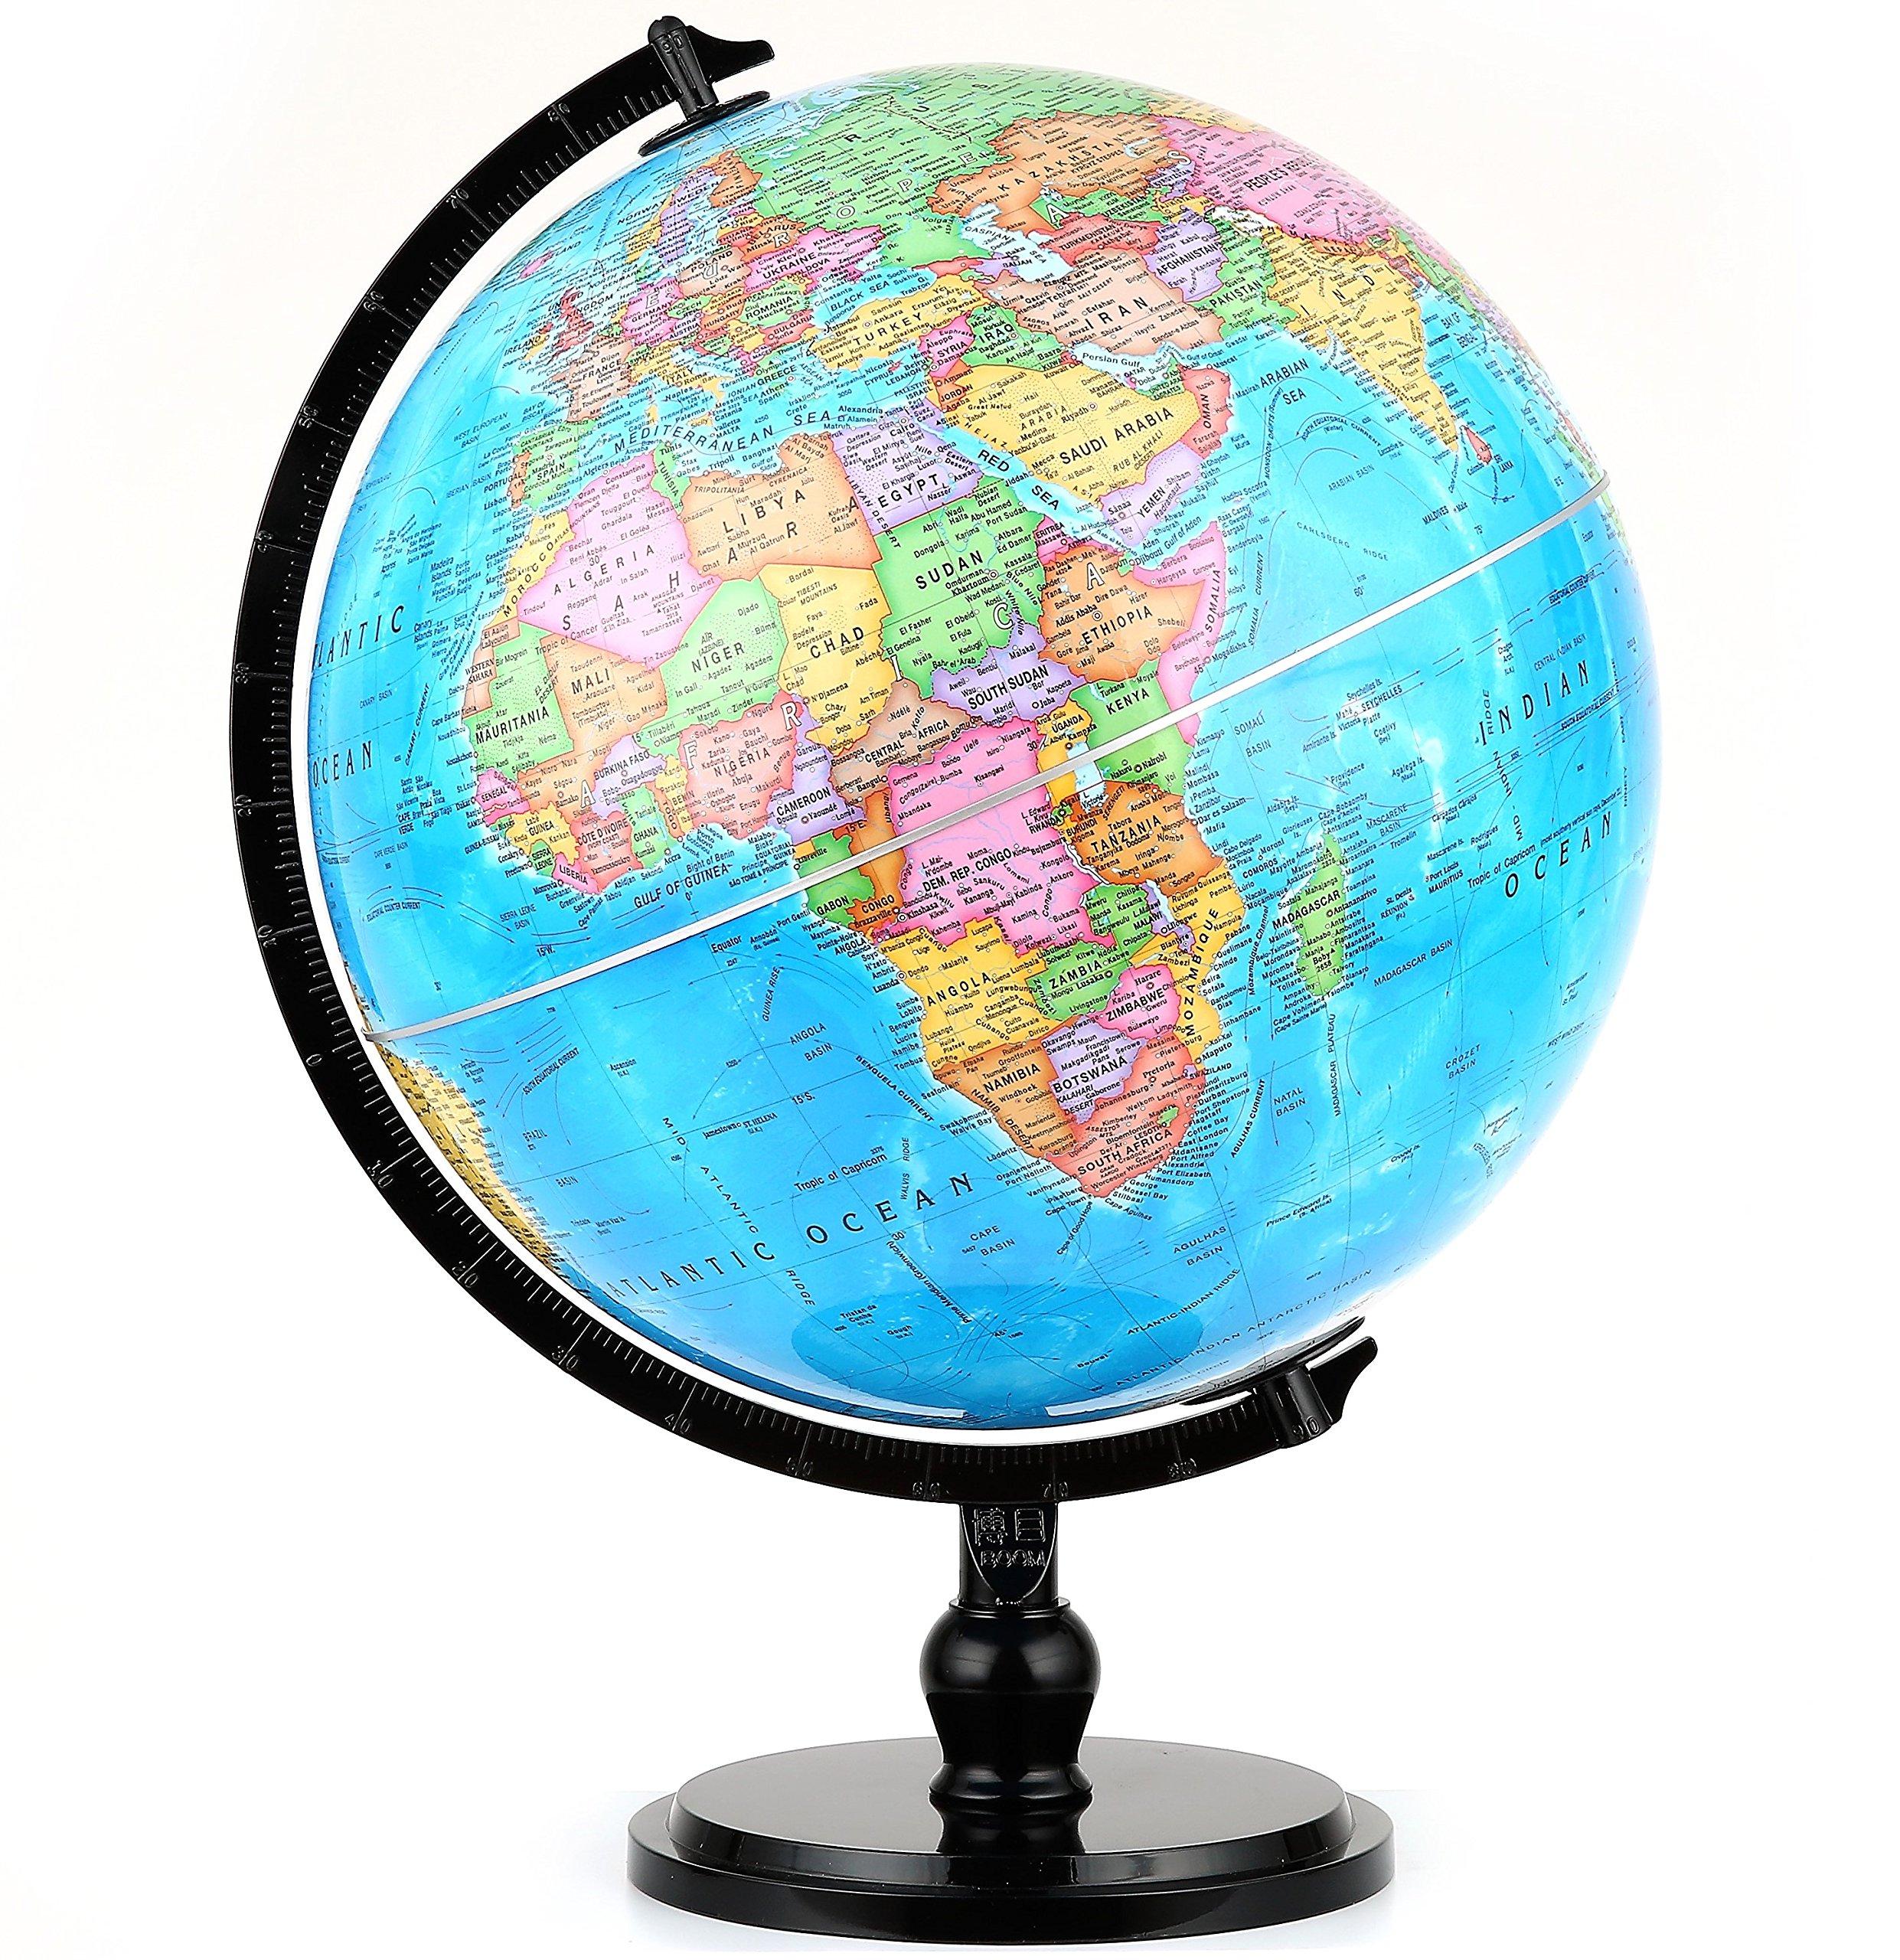 Illuminated Blue Ocean Globe (12.5''/32 cm diameter)-Educational Globe for Kids & Teachers, Over 5,000 Place Names, Energy-Saving LED, Weighted Base